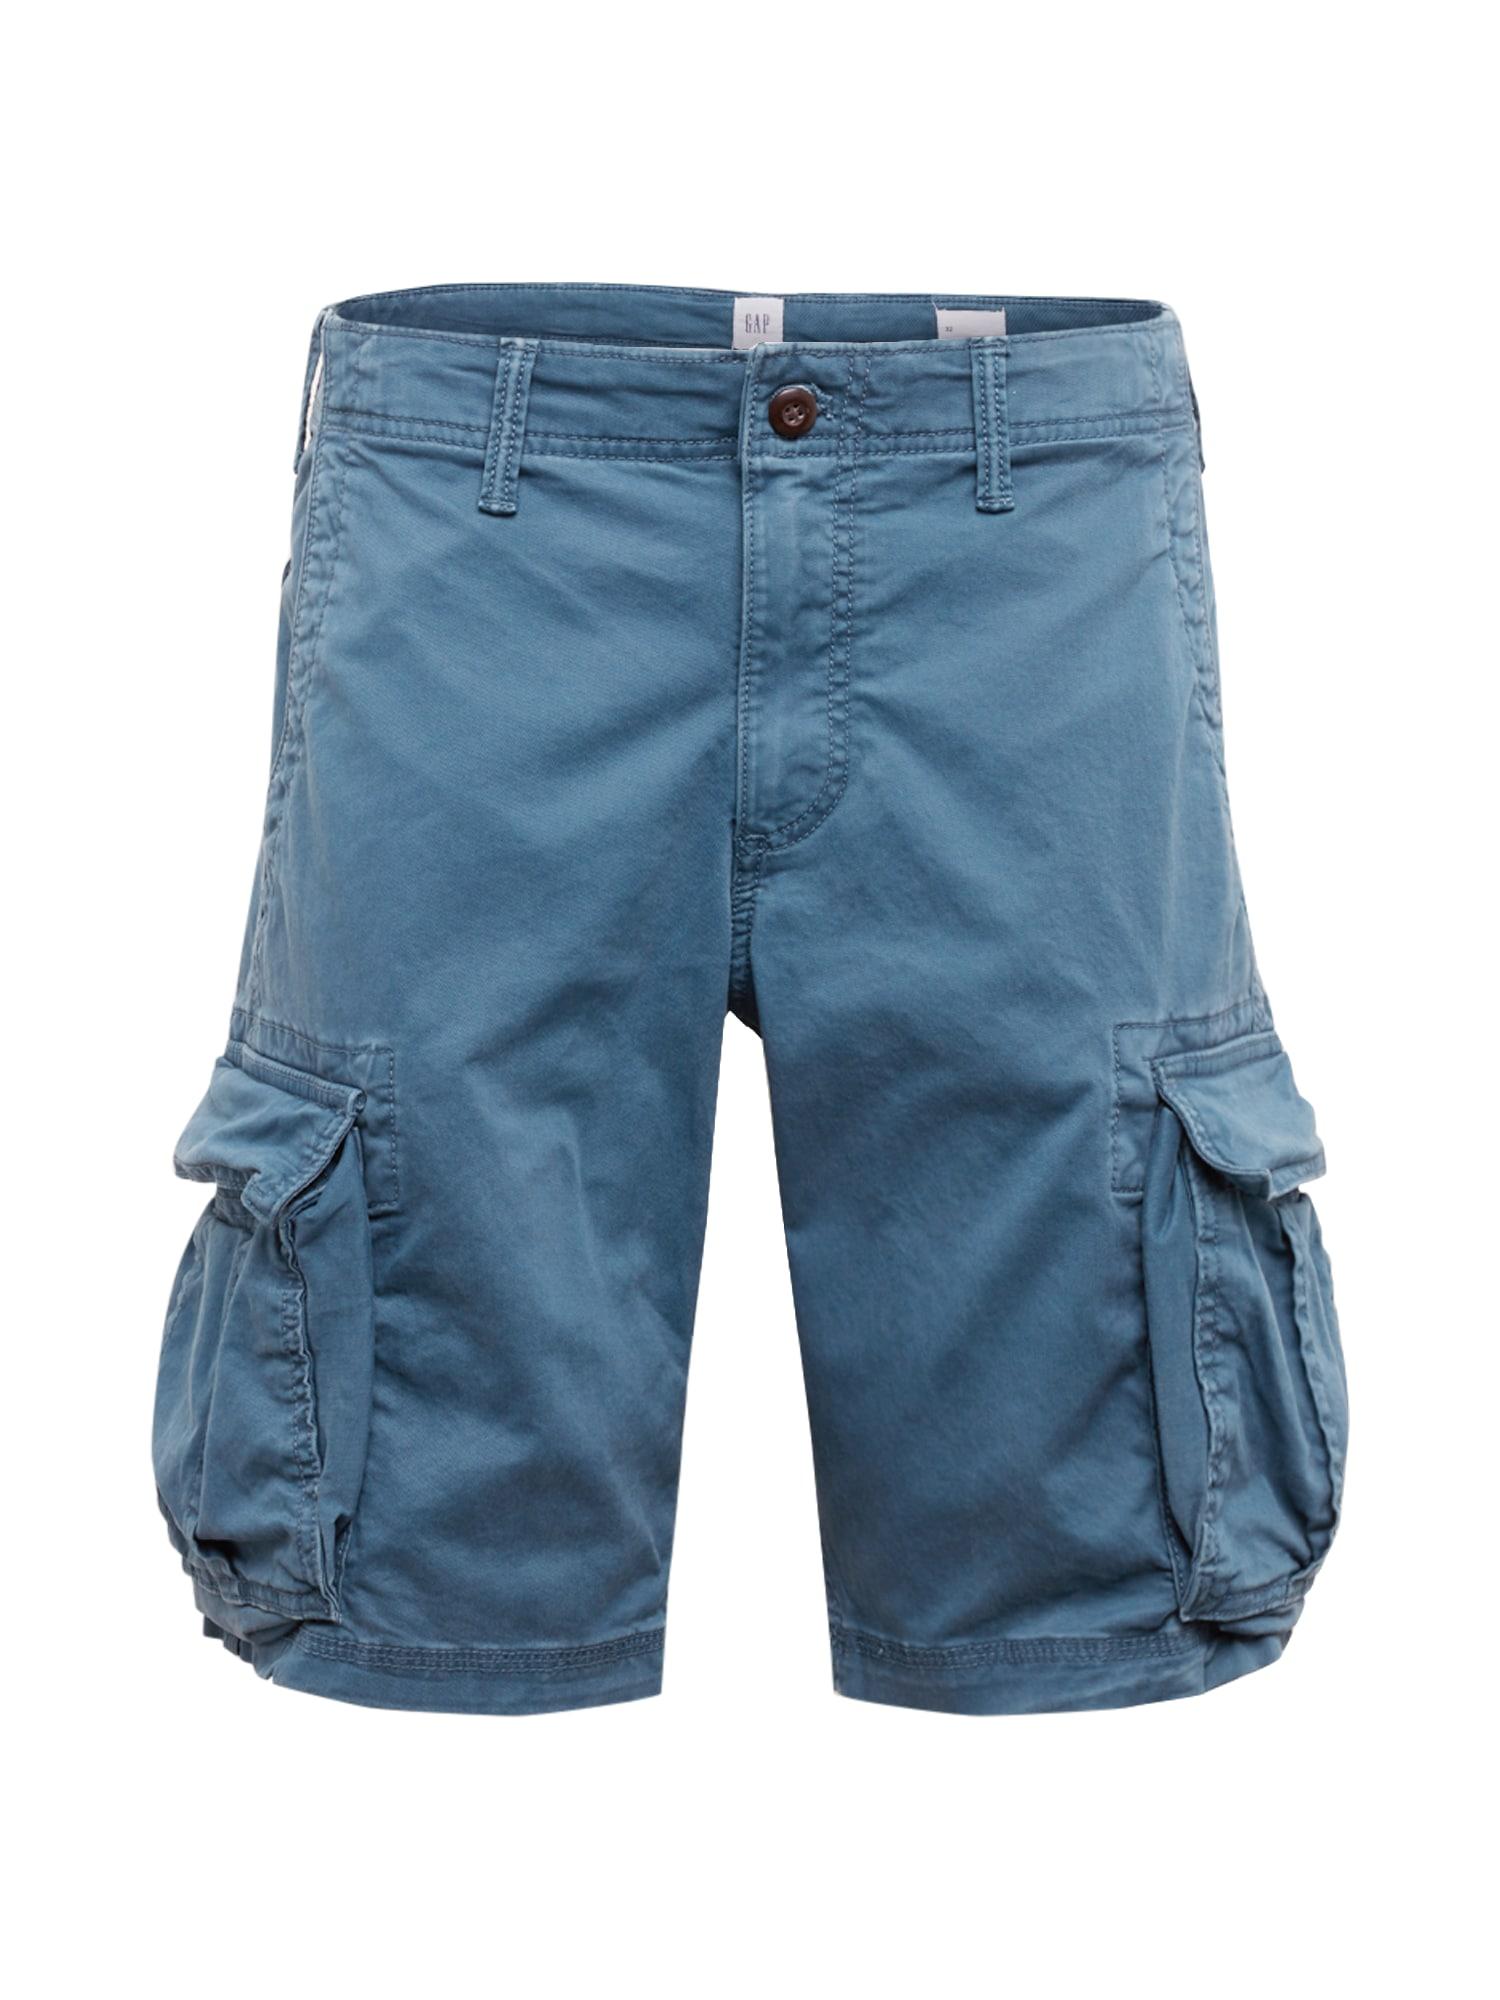 GAP Laisvo stiliaus kelnės mėlyna